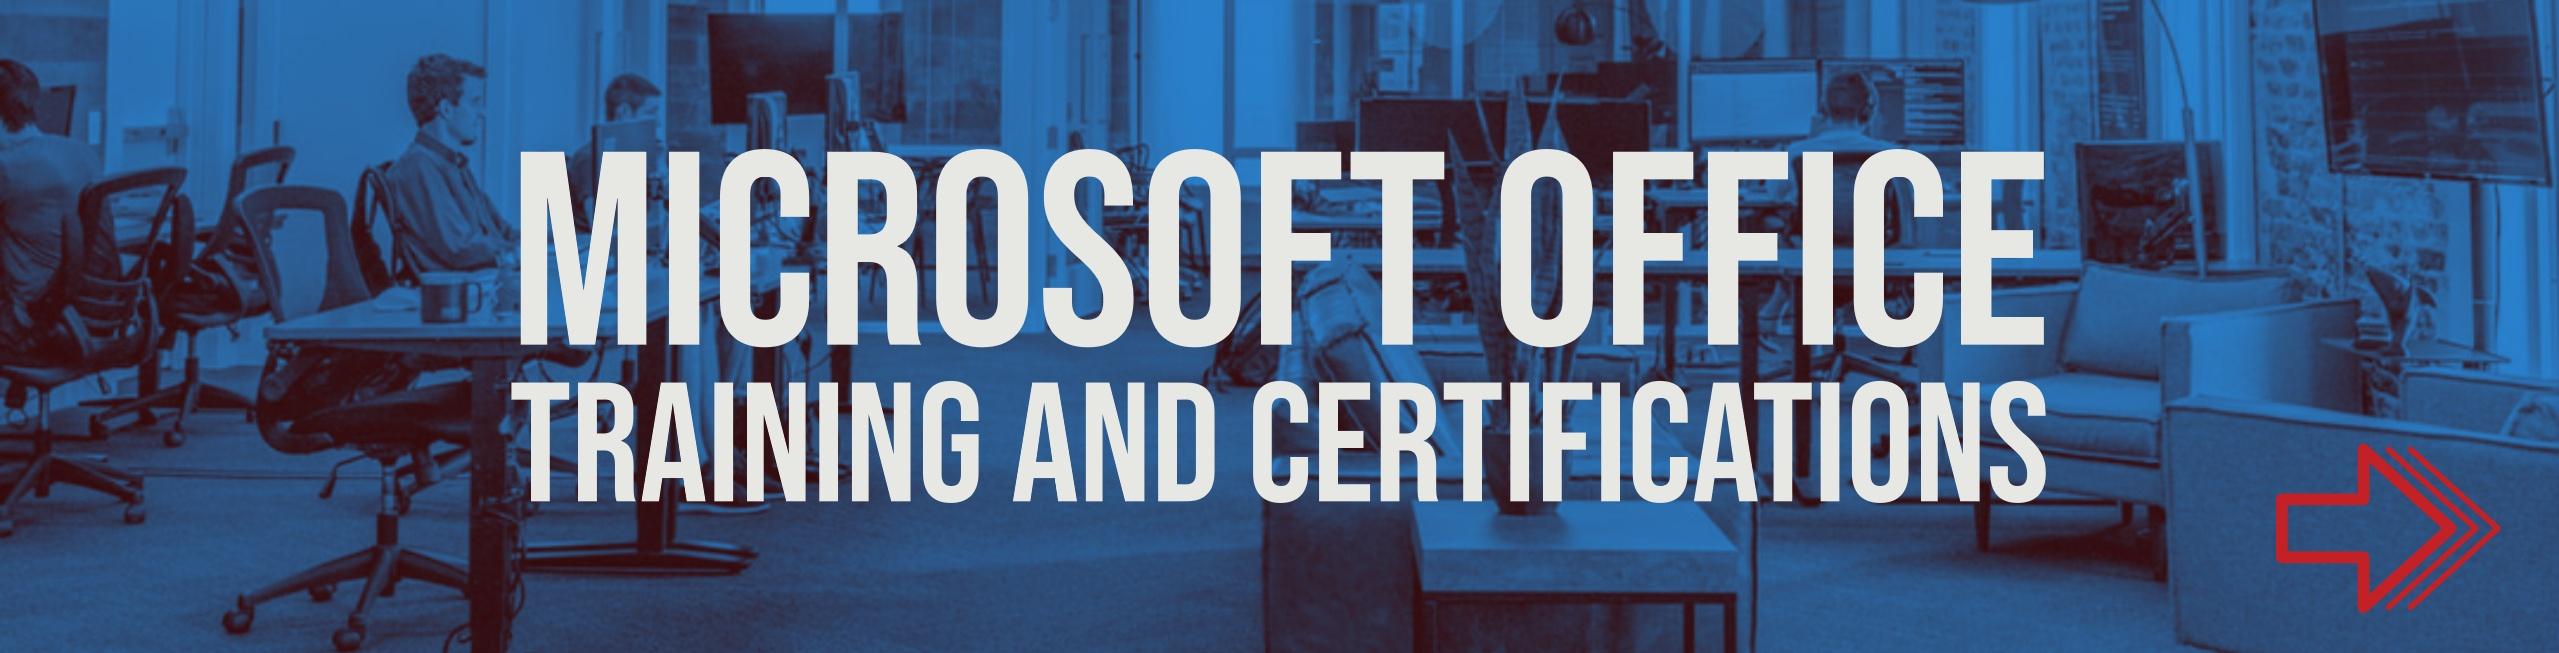 New Horizons Microsoft Office Training